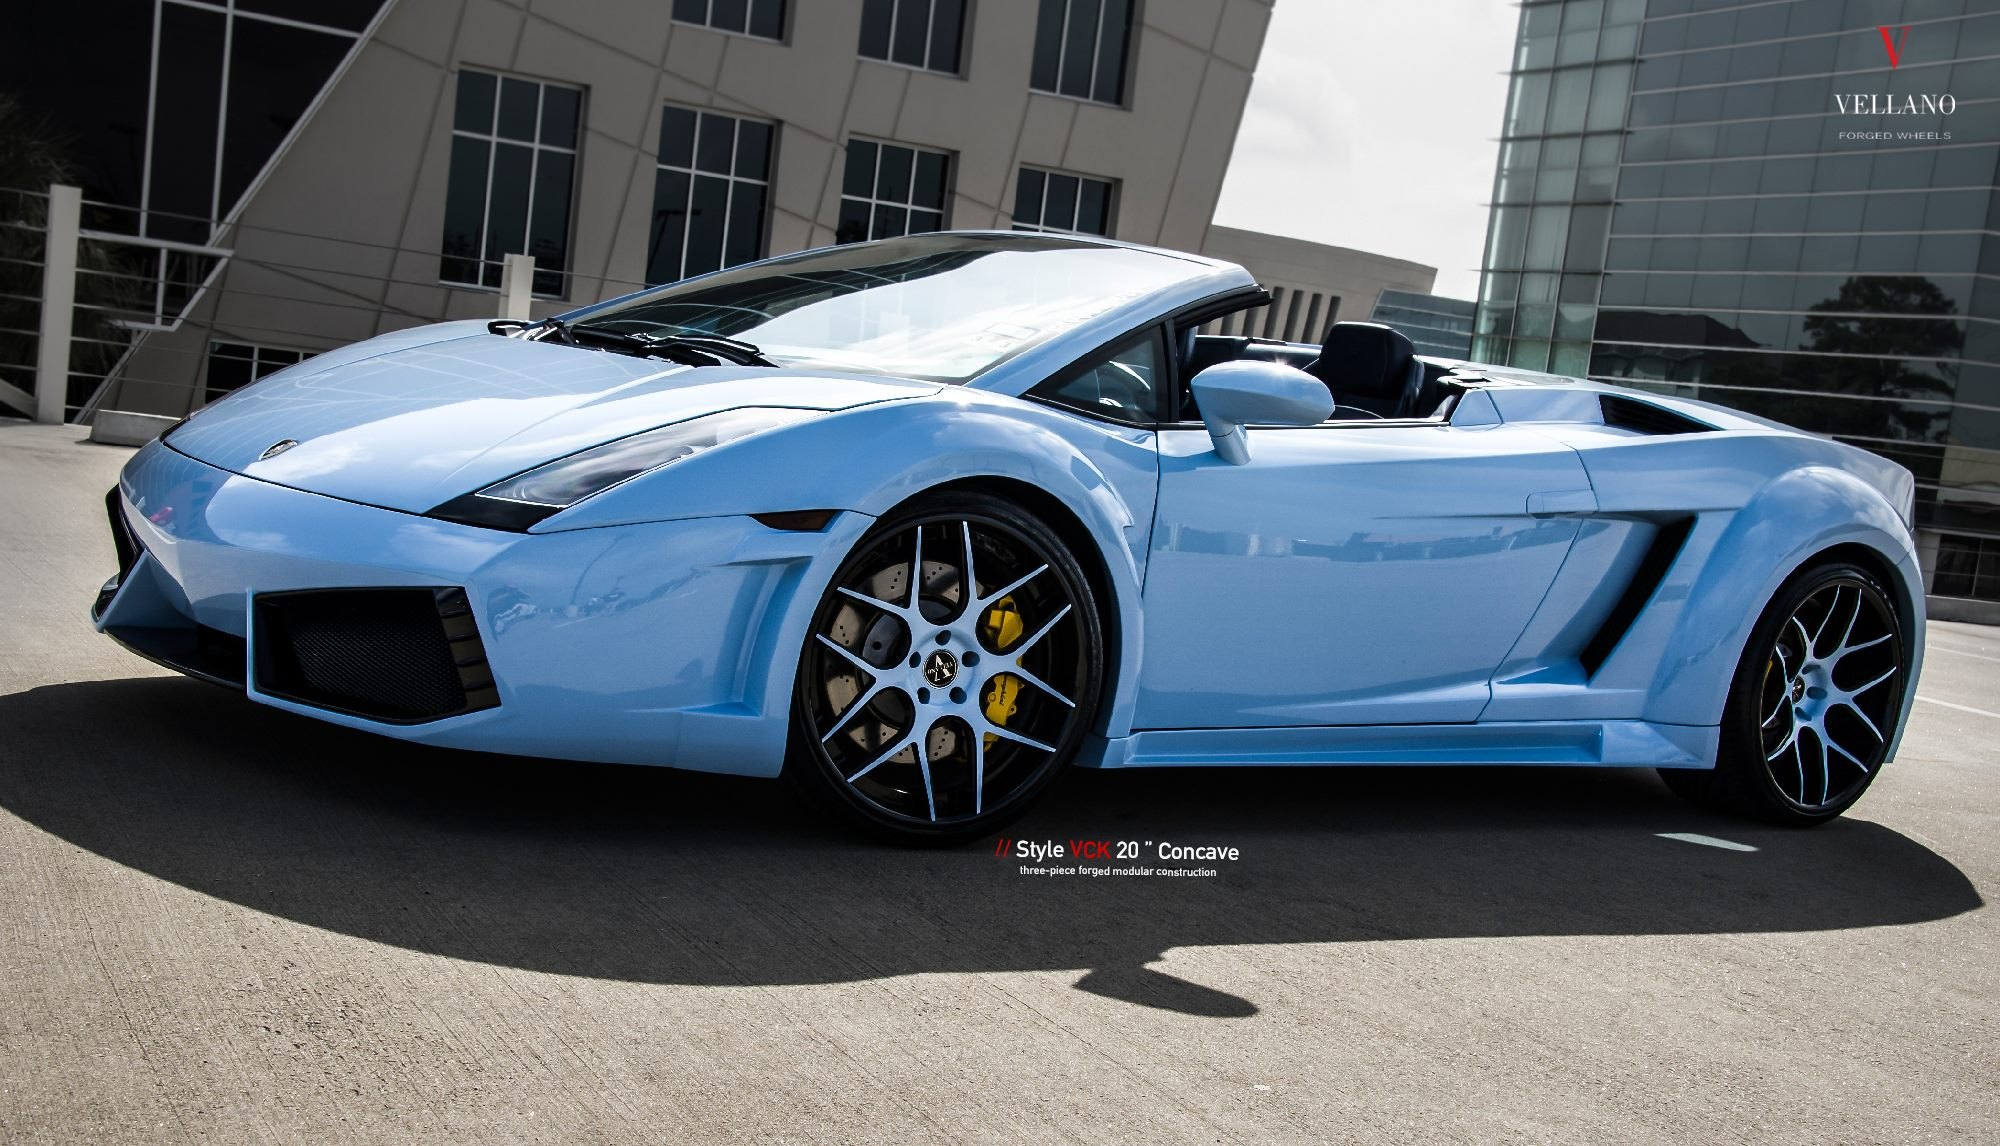 Baby Blue Convertible Lamborghini Gallardo Customized And Put On Color Matched Rims Carid Com Gallery